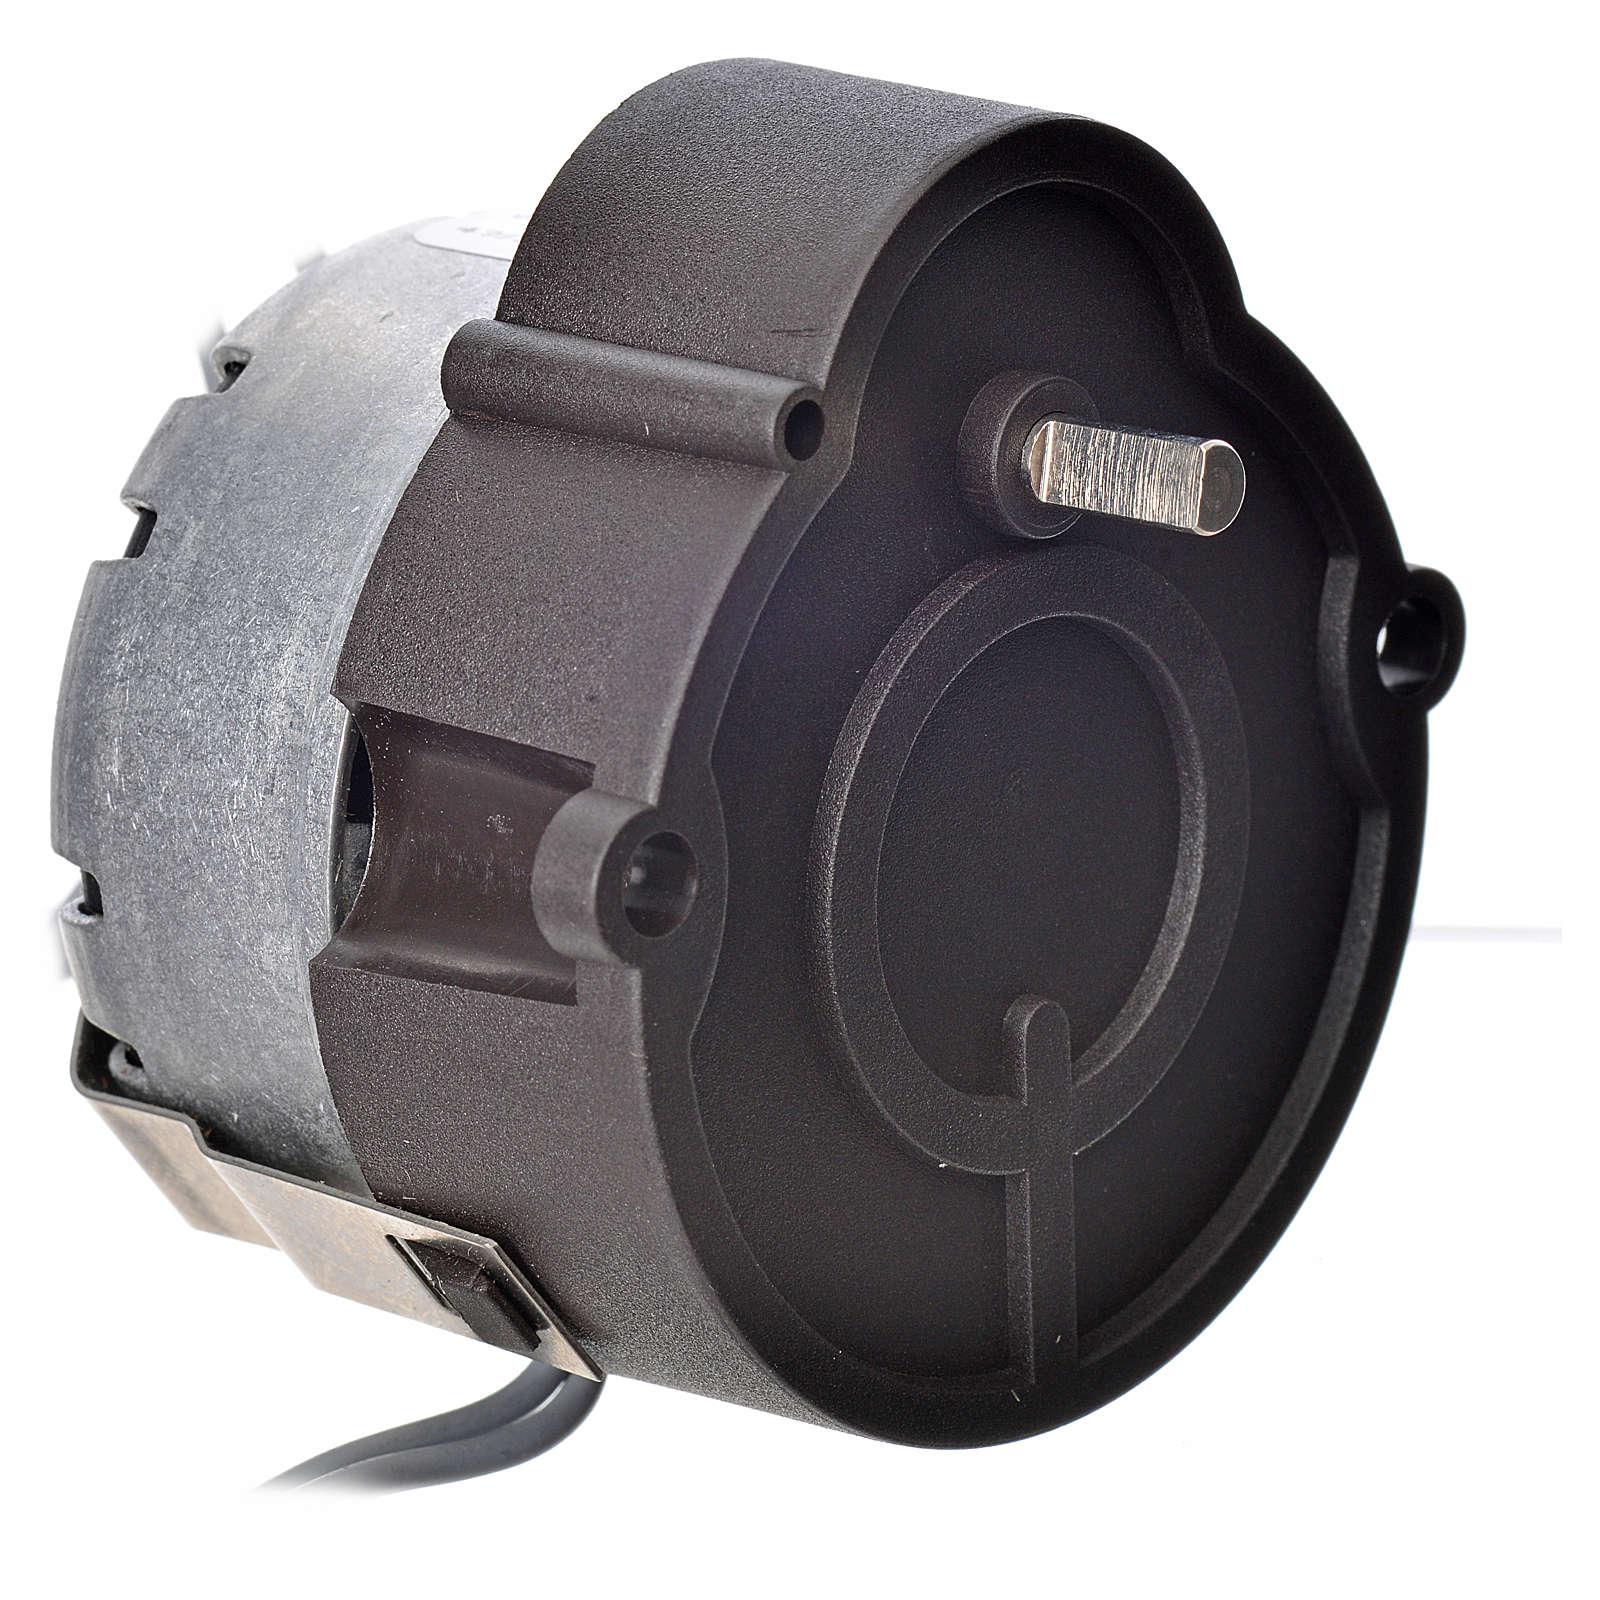 Motoriduttore presepe  MR giri/minuto 2 4